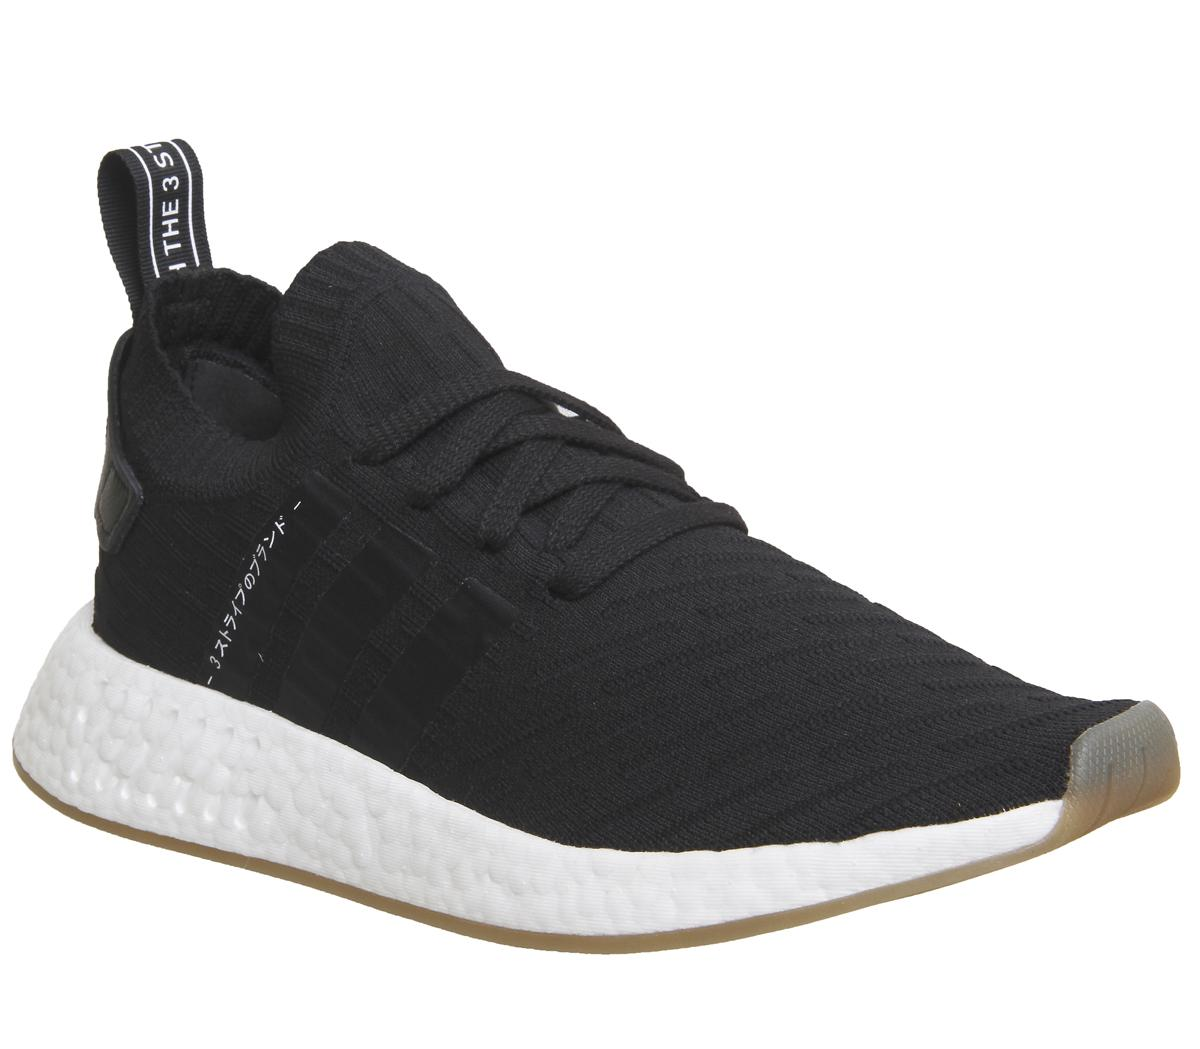 adidas nmd r2 pk trainers black white cheap online